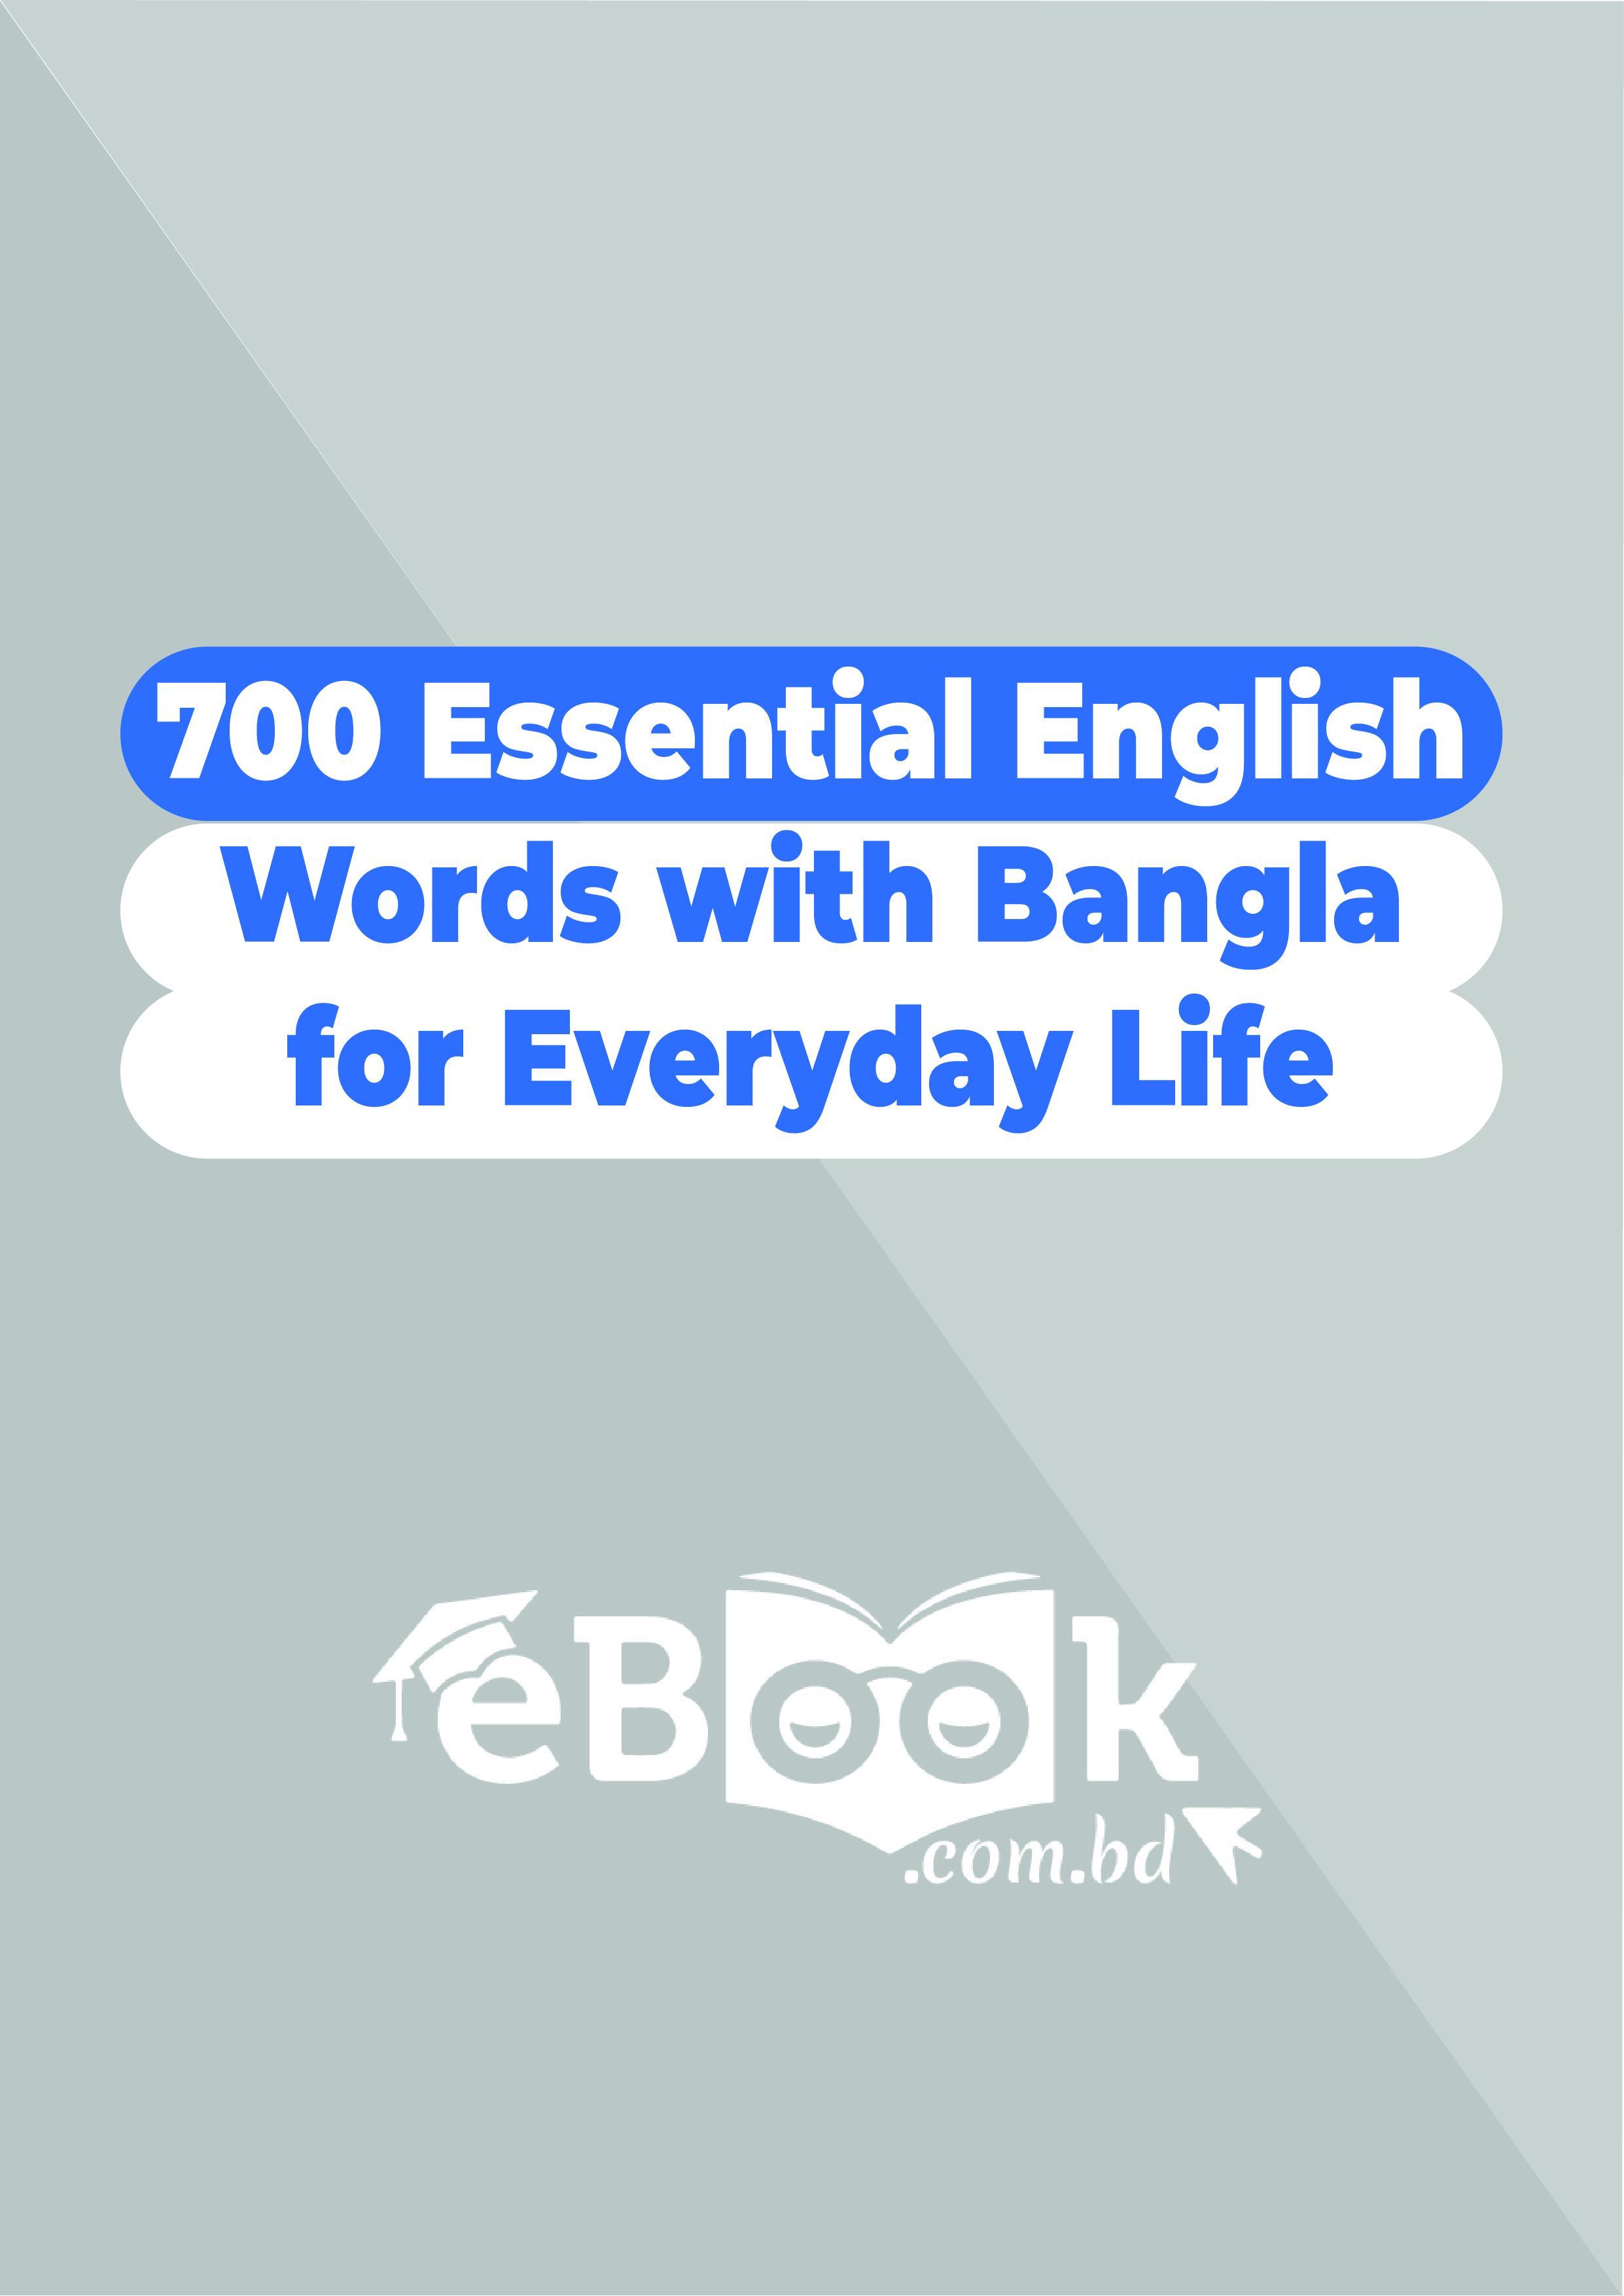 700 Essential English Words with Bangla for Everyday Life - ৭০০ প্রয়োজনীয় ইংরেজি শব্দ বাংলা অর্থসহ